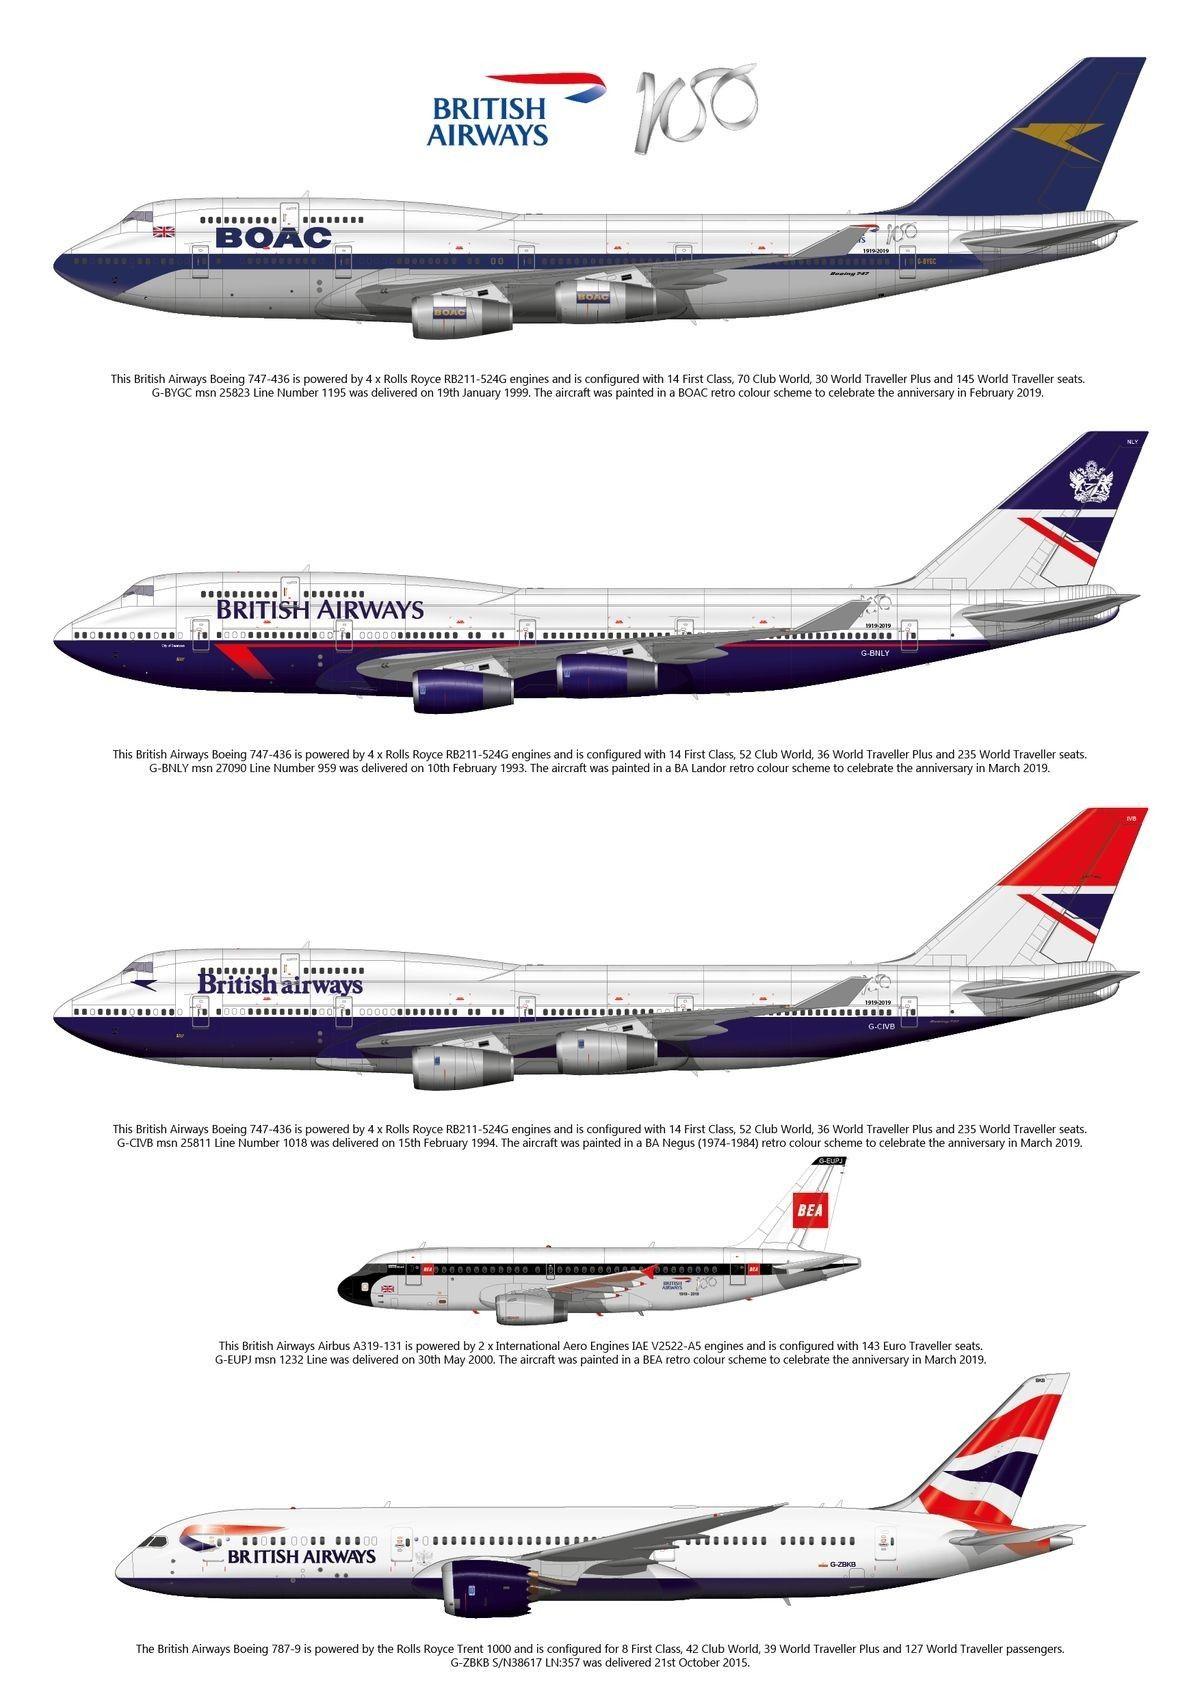 Pin by Enzo Garau on Aeroplanes | Boeing aircraft, British